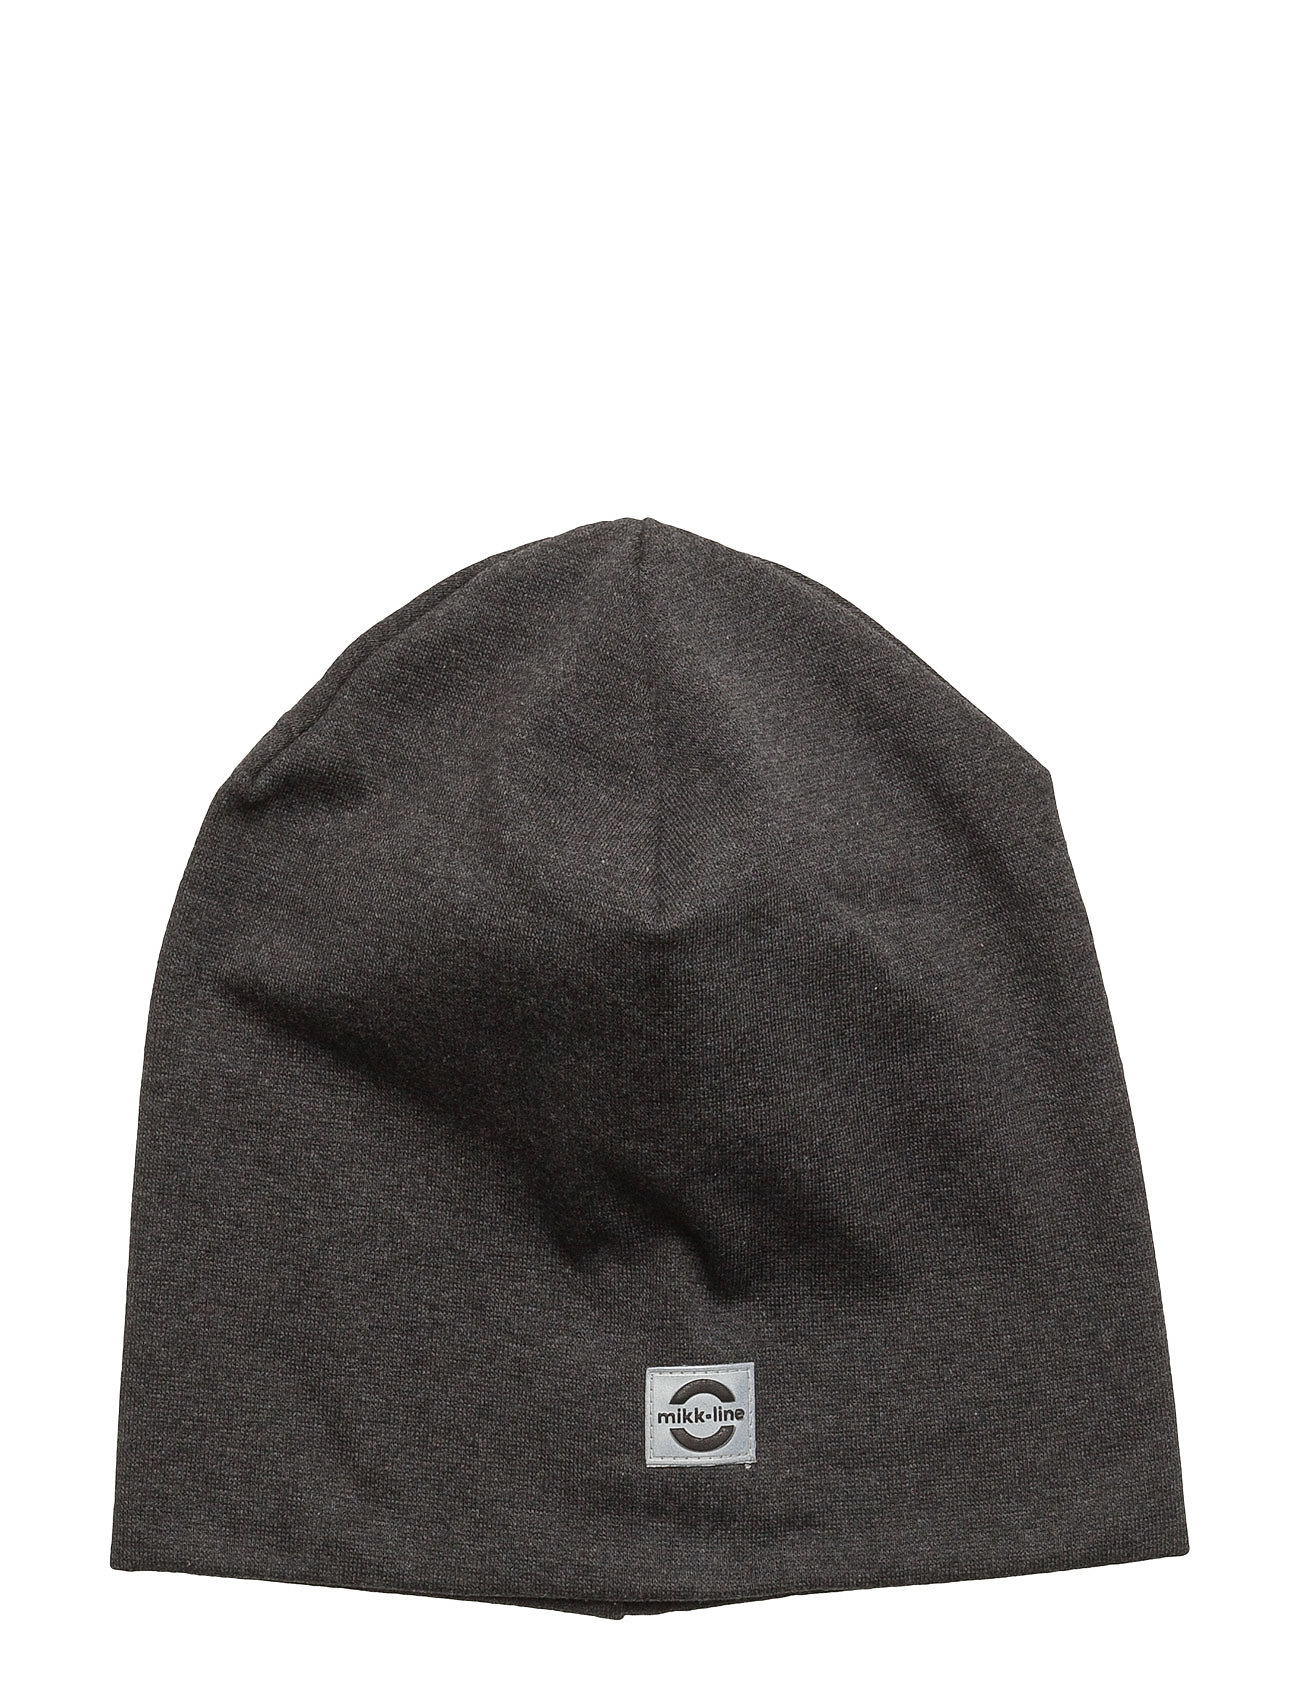 Image of Cotton Hat - Solid Accessories Headwear Hats Grå Mikk-Line (3406127937)